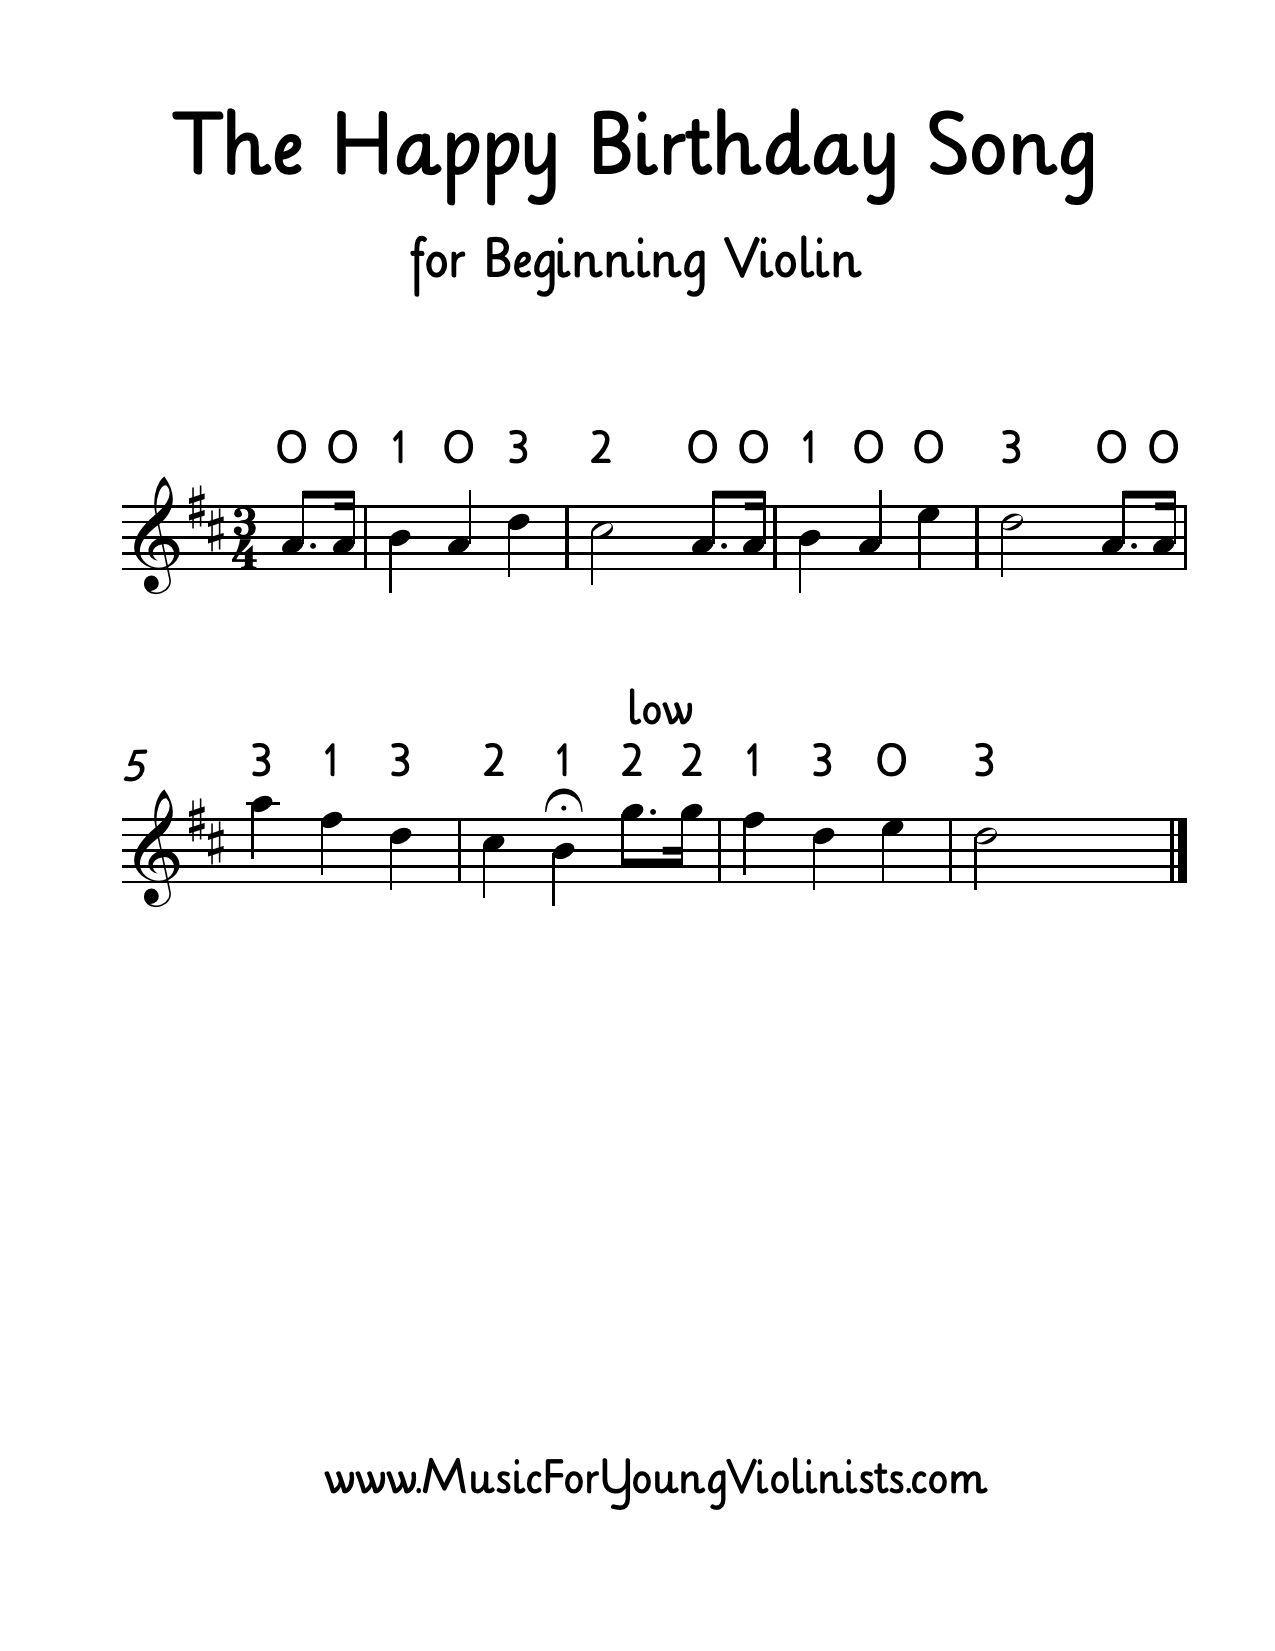 Happy Birthday Violin Songs Violin Sheet Music Happy Birthday Song